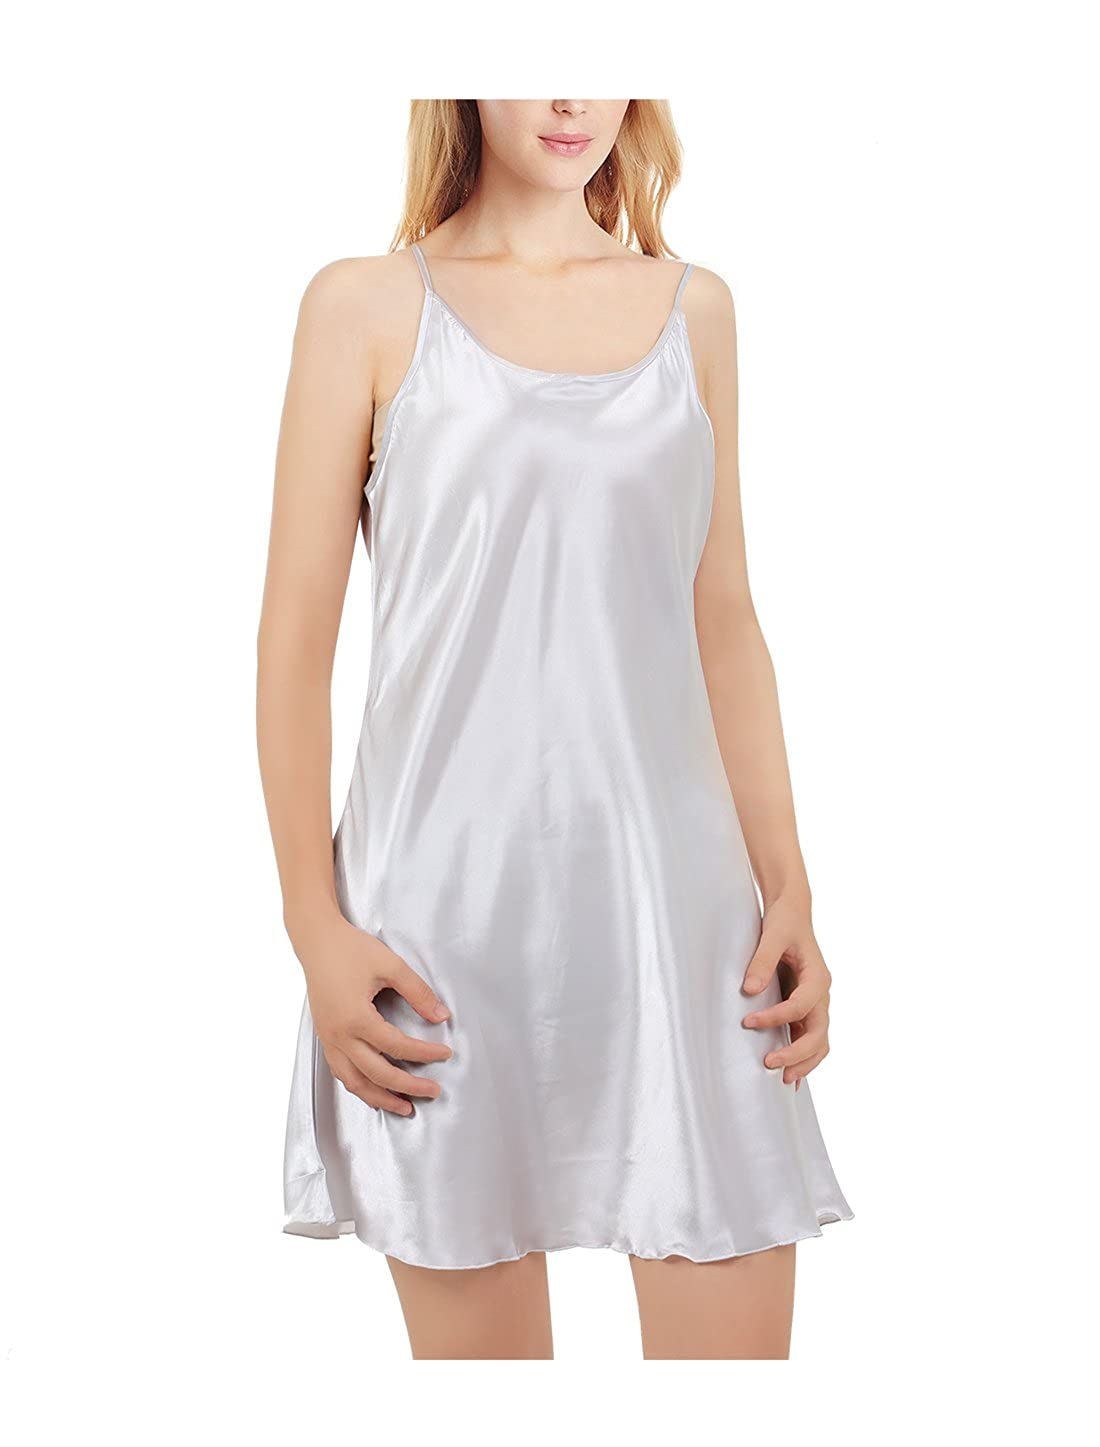 uxcell Women Silky Plus Size Lotus Leaf Hem Basic Dress Full Slip Camisole g17060700ux0139